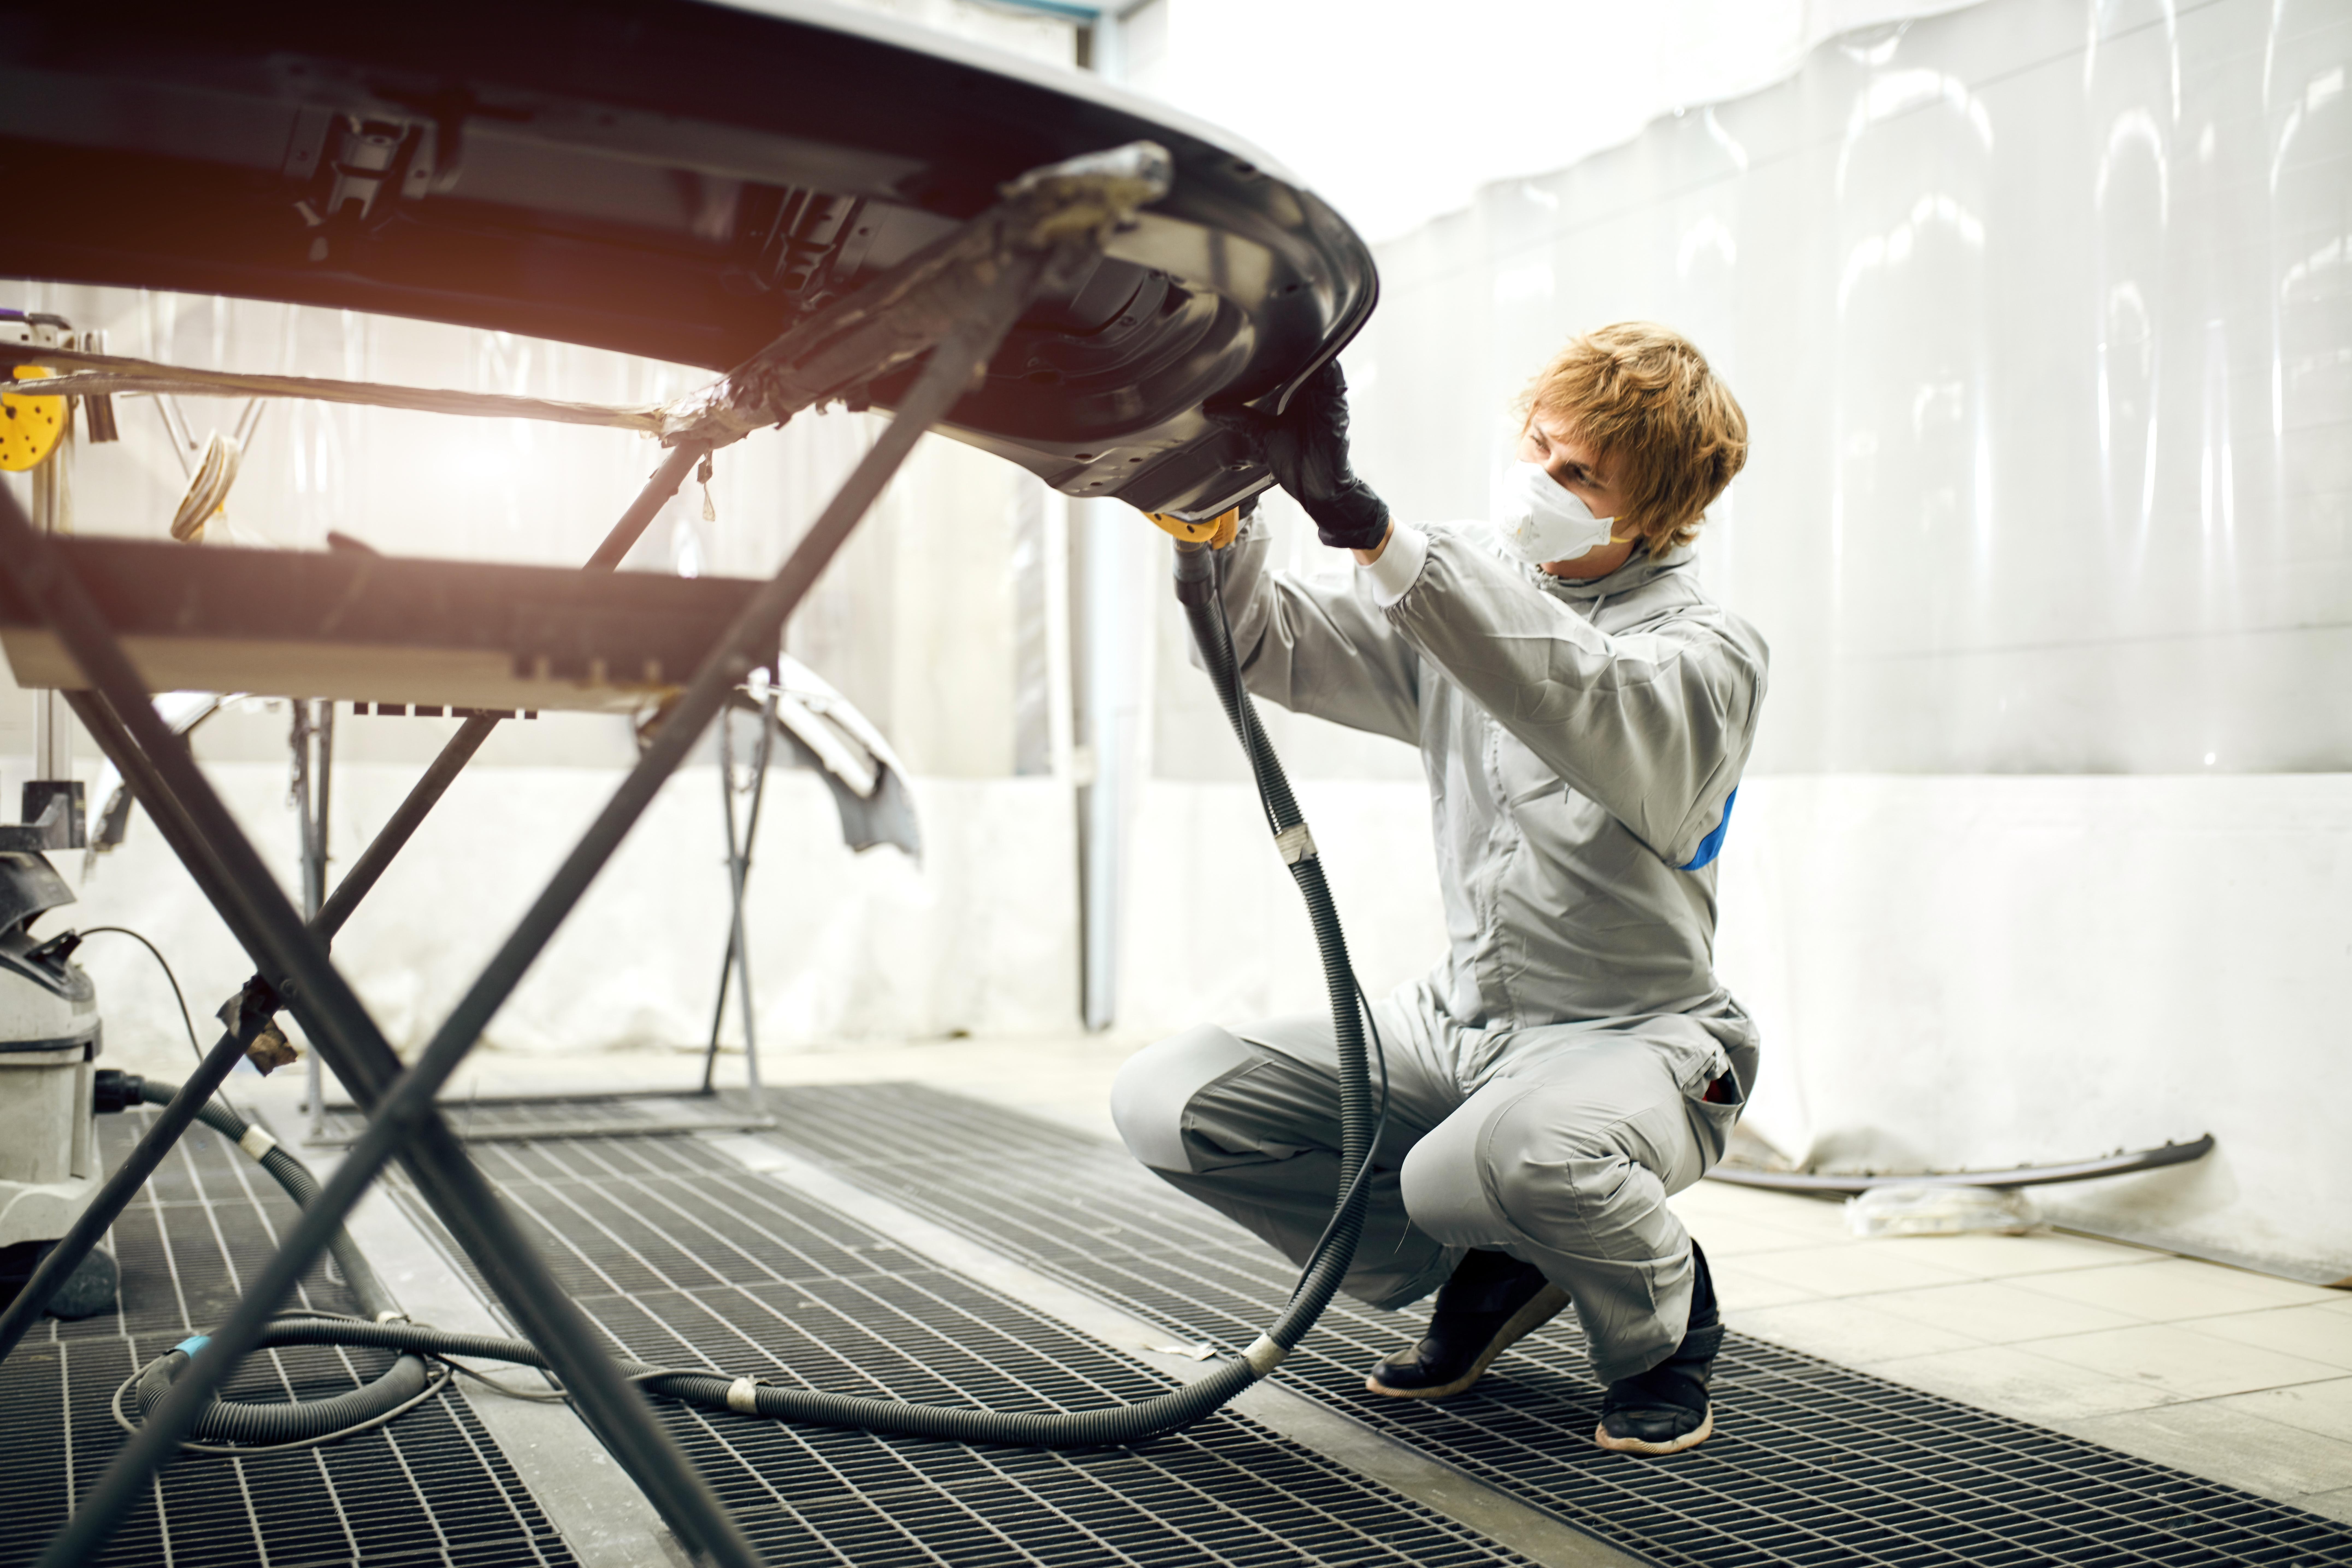 Ernst Auto Group Auto Body Technician